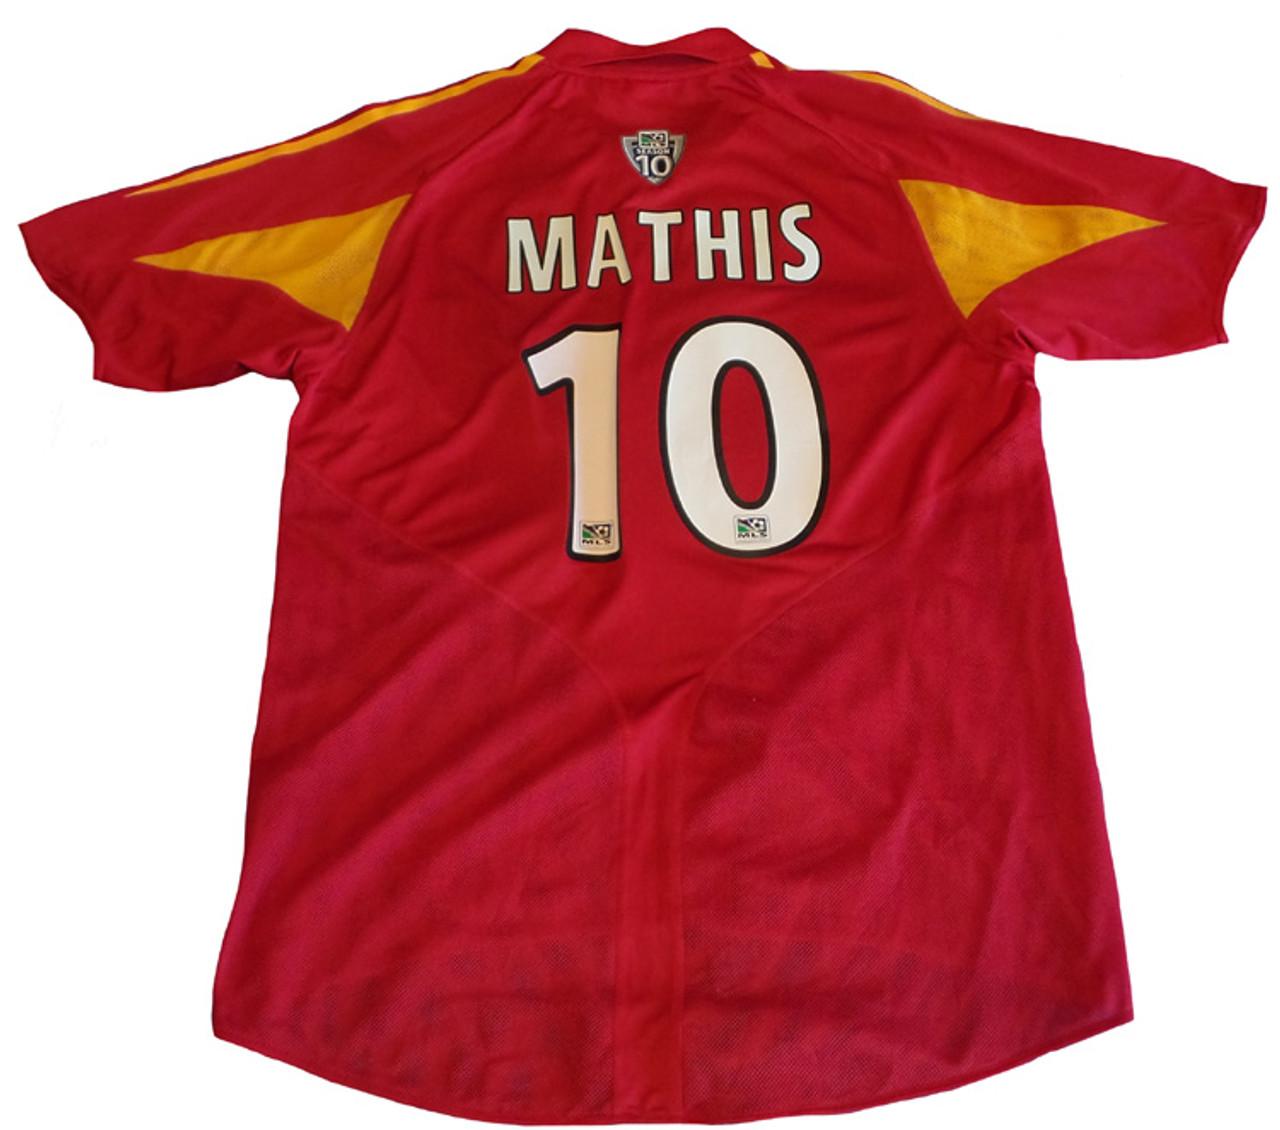 e84a7899c00 ADIDAS REAL SALT LAKE 2006 MATHIS HOME JERSEY - Soccer Plus